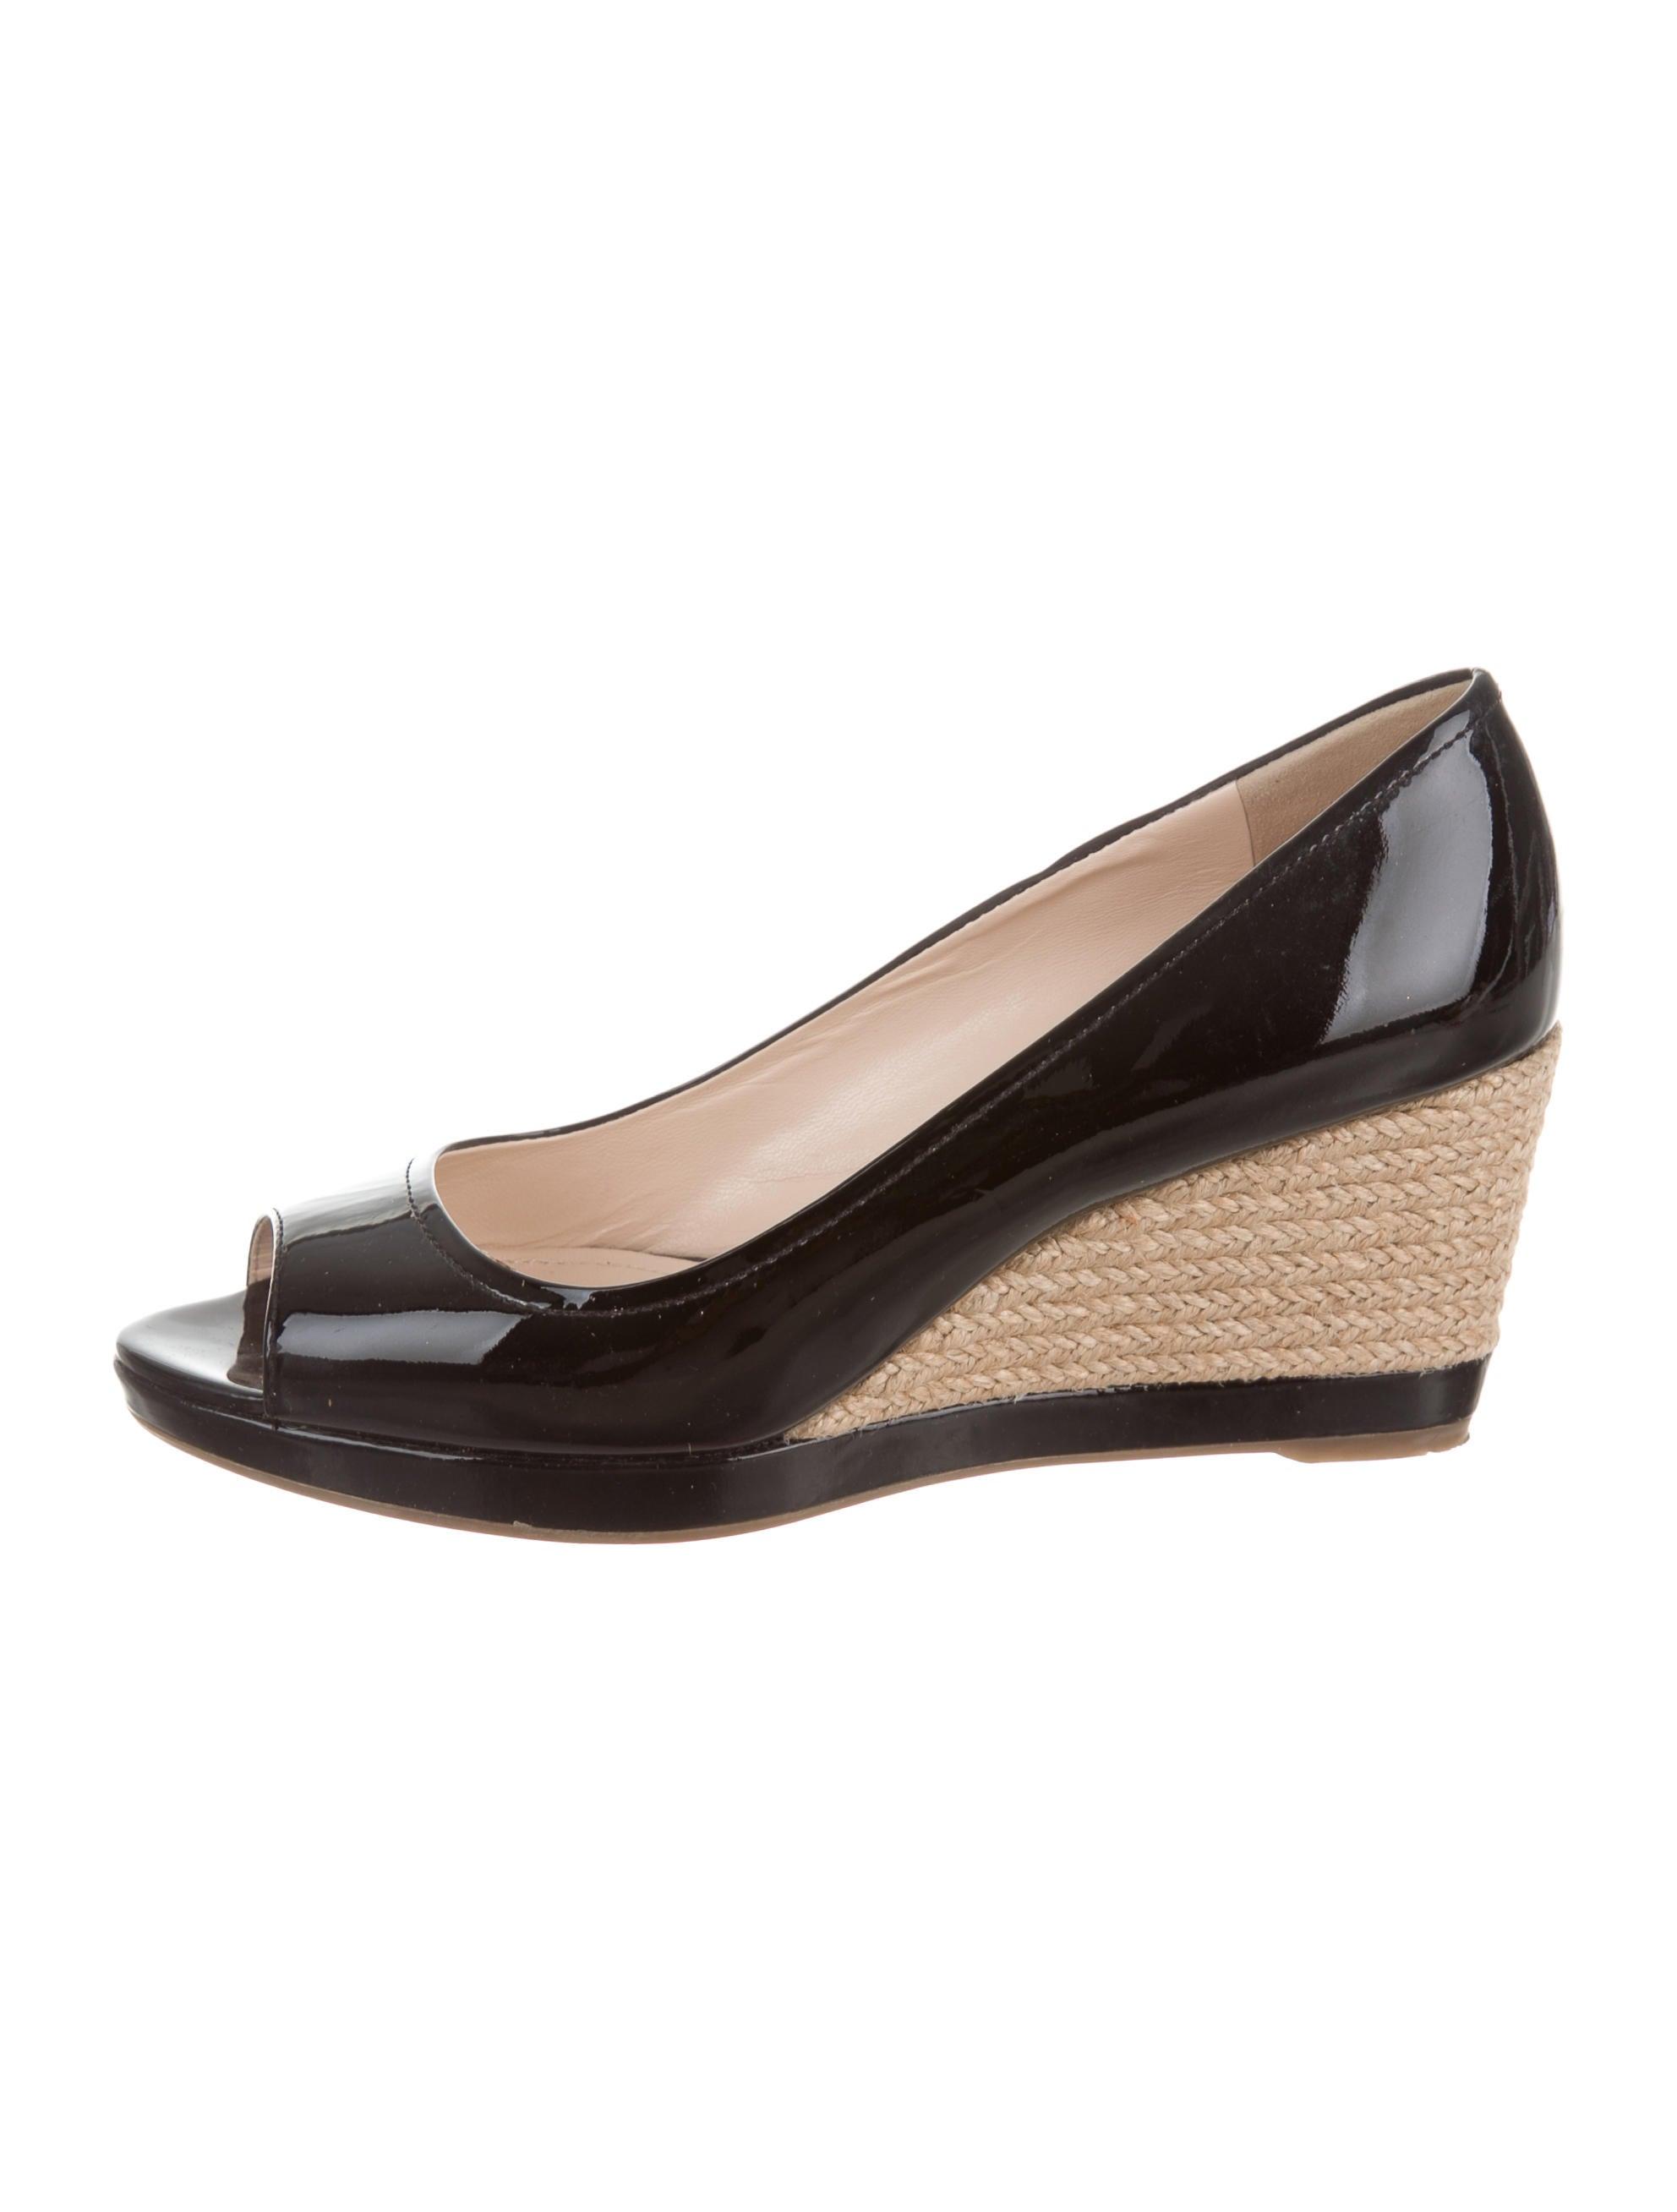 prada sport peep toe espadrille wedges shoes wpr39816